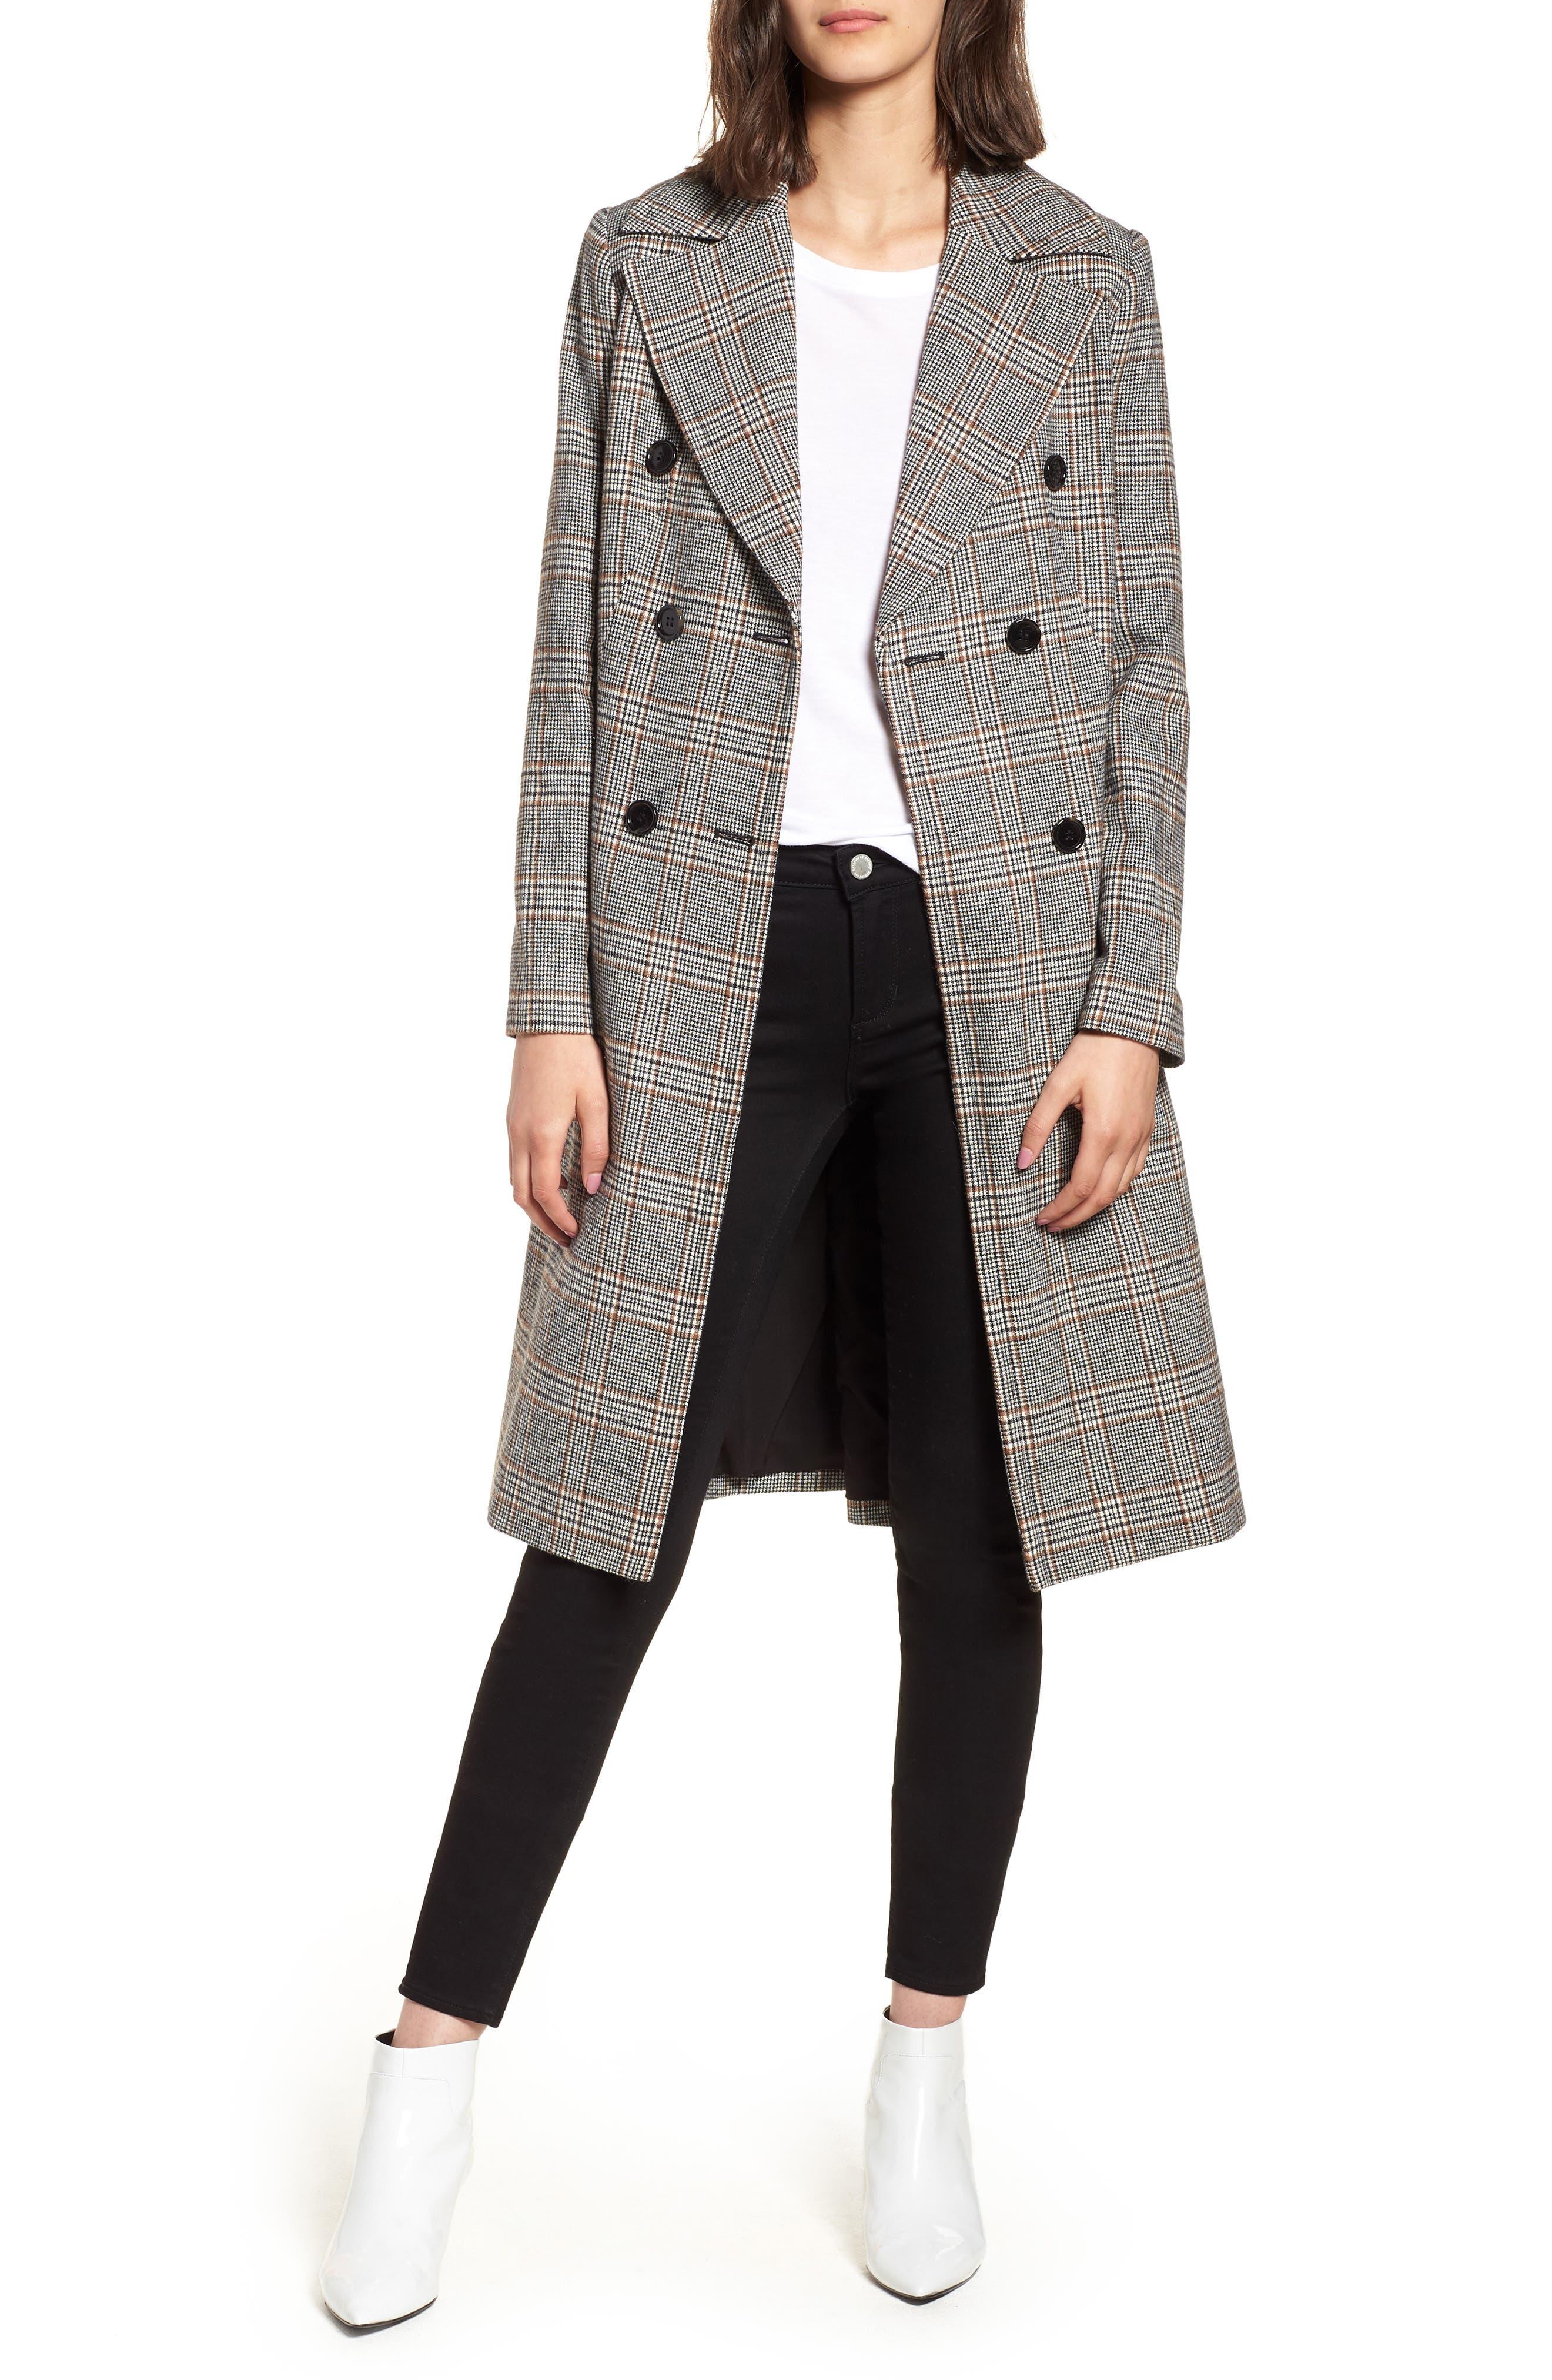 MURAL,                             Blazer Midi Coat,                             Main thumbnail 1, color,                             001